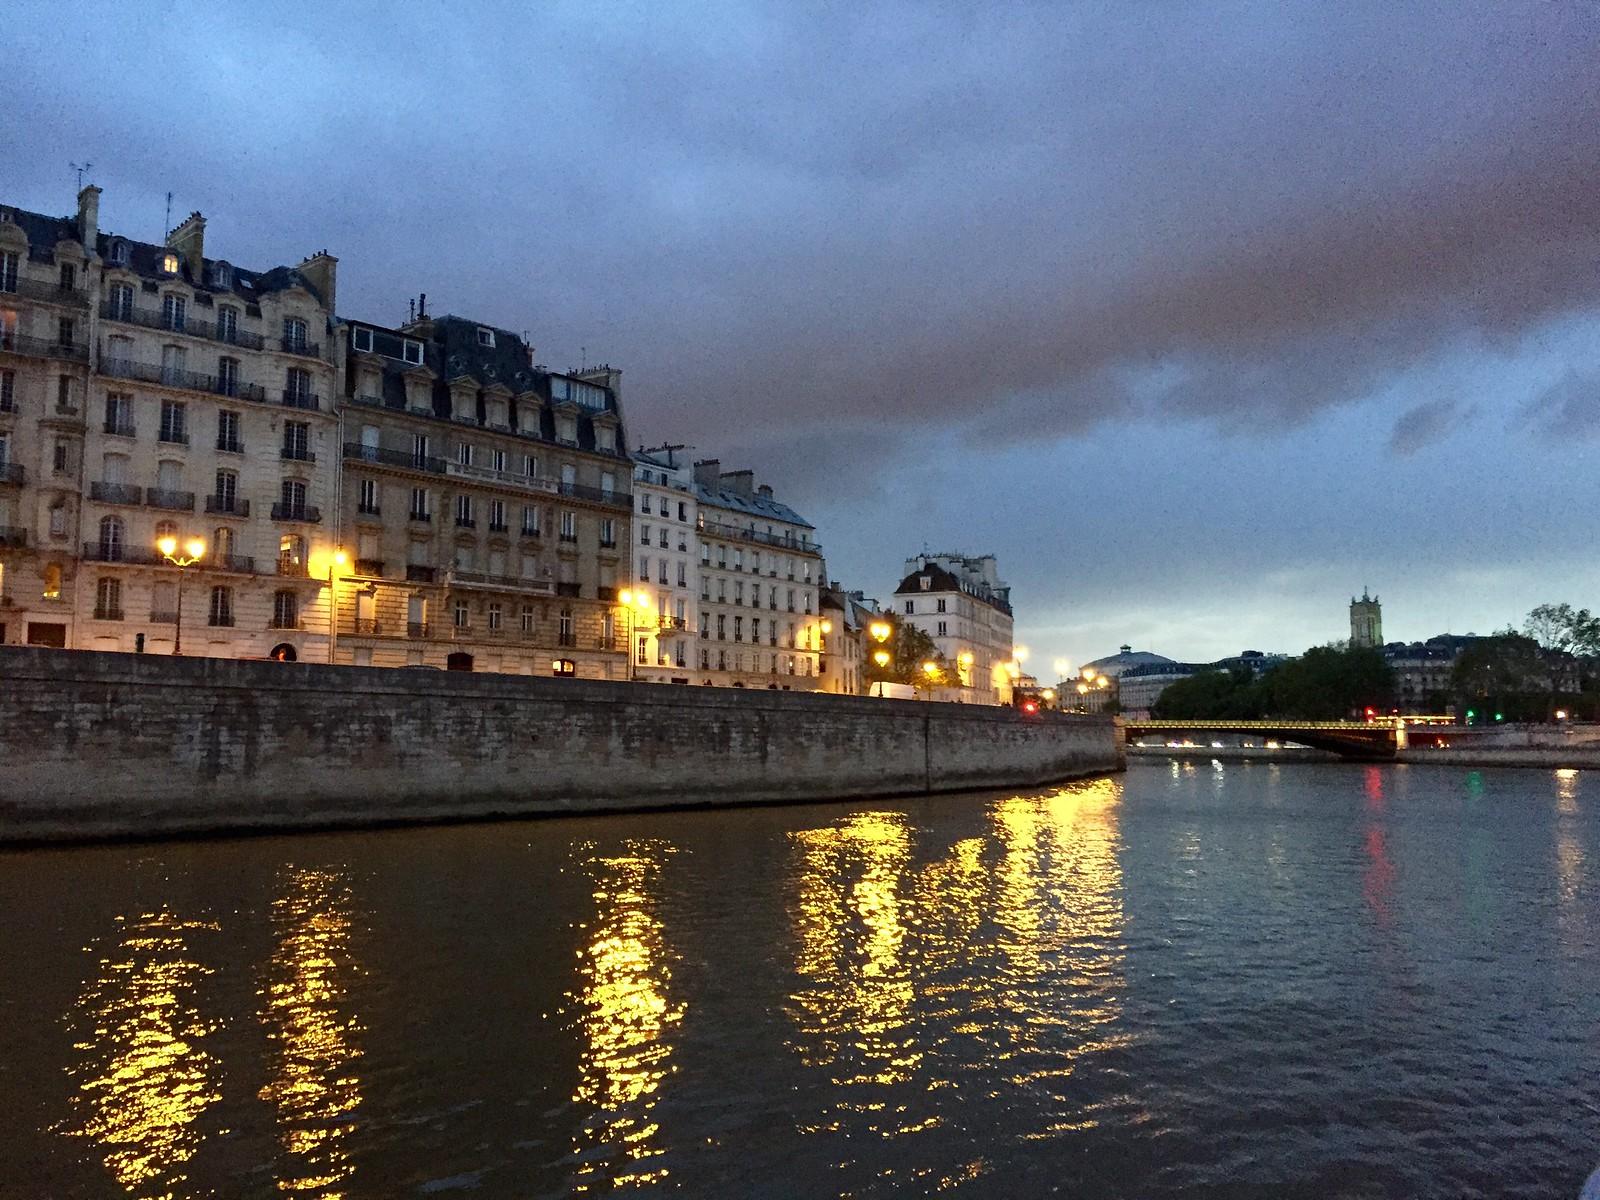 Urban Scene_A Li_Paris, France